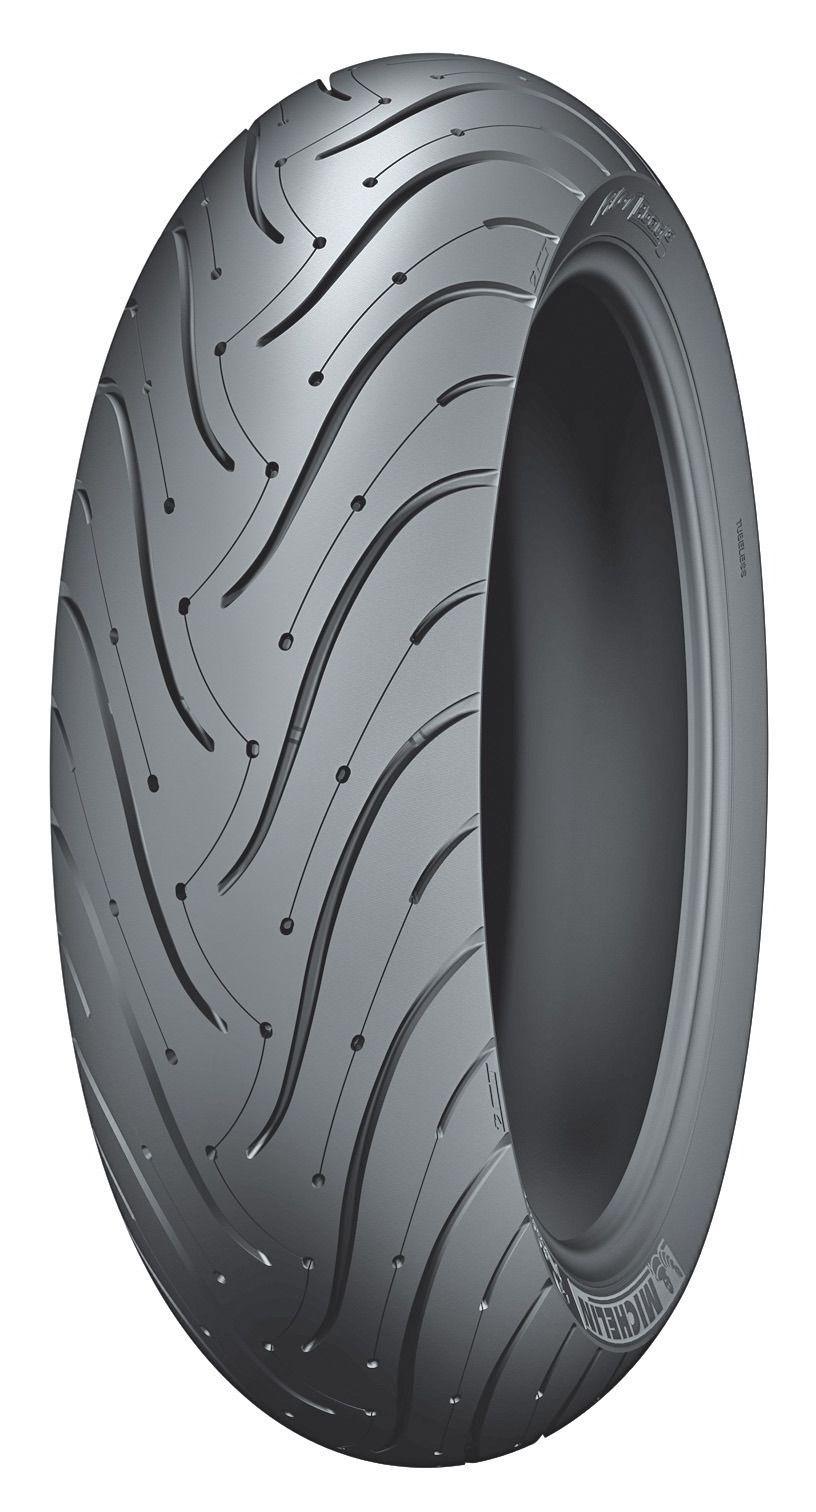 michelin pilot road 3 rear tires revzilla. Black Bedroom Furniture Sets. Home Design Ideas